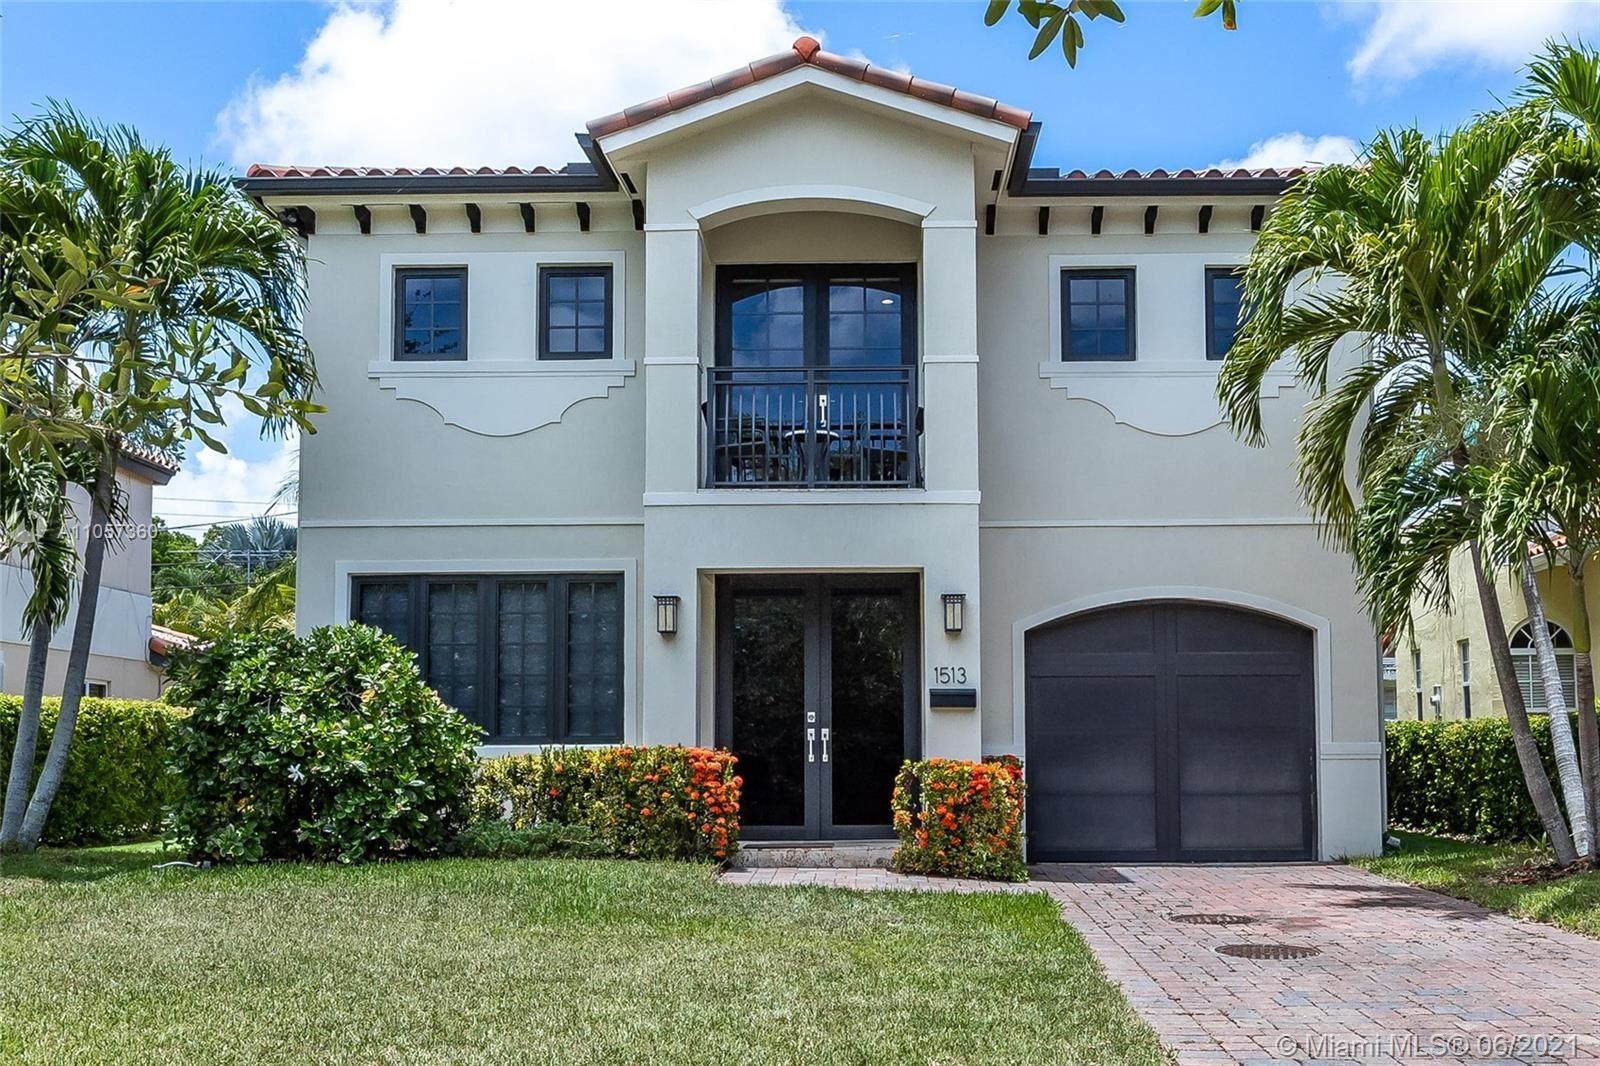 1513 Algardi Ave, Coral Gables, FL 33146 - #: A11057360